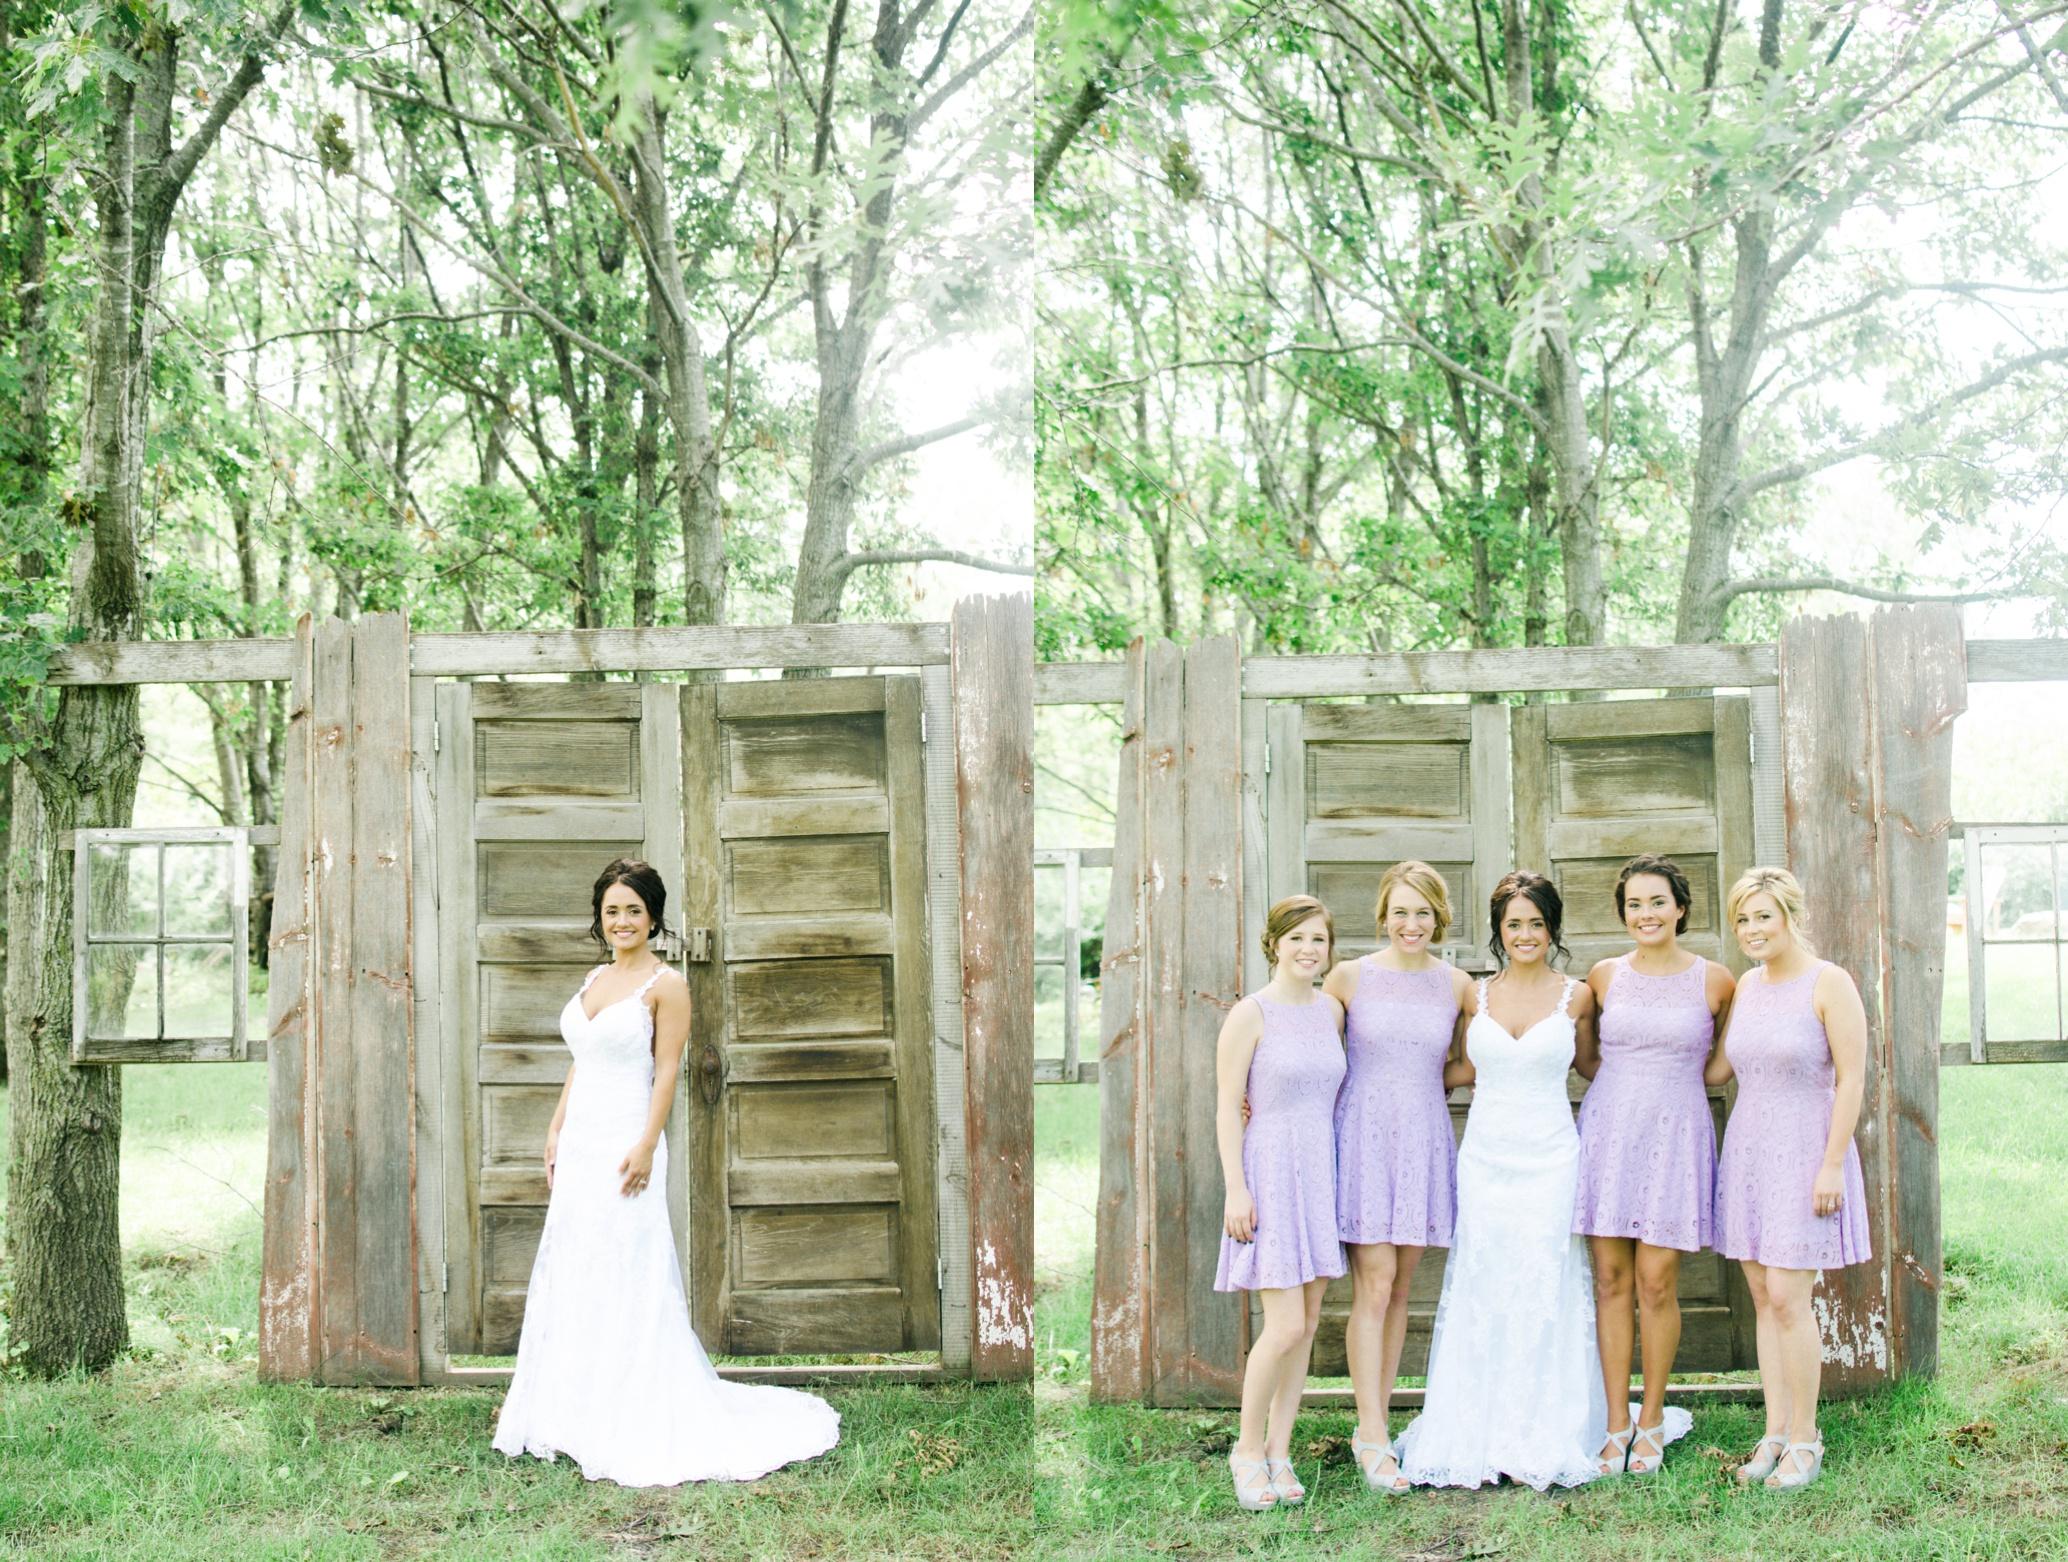 Barnes' Place Rustic Outdoor Wedding | Ali Leigh Photo Minneapolis Wedding Photographer_0104.jpg